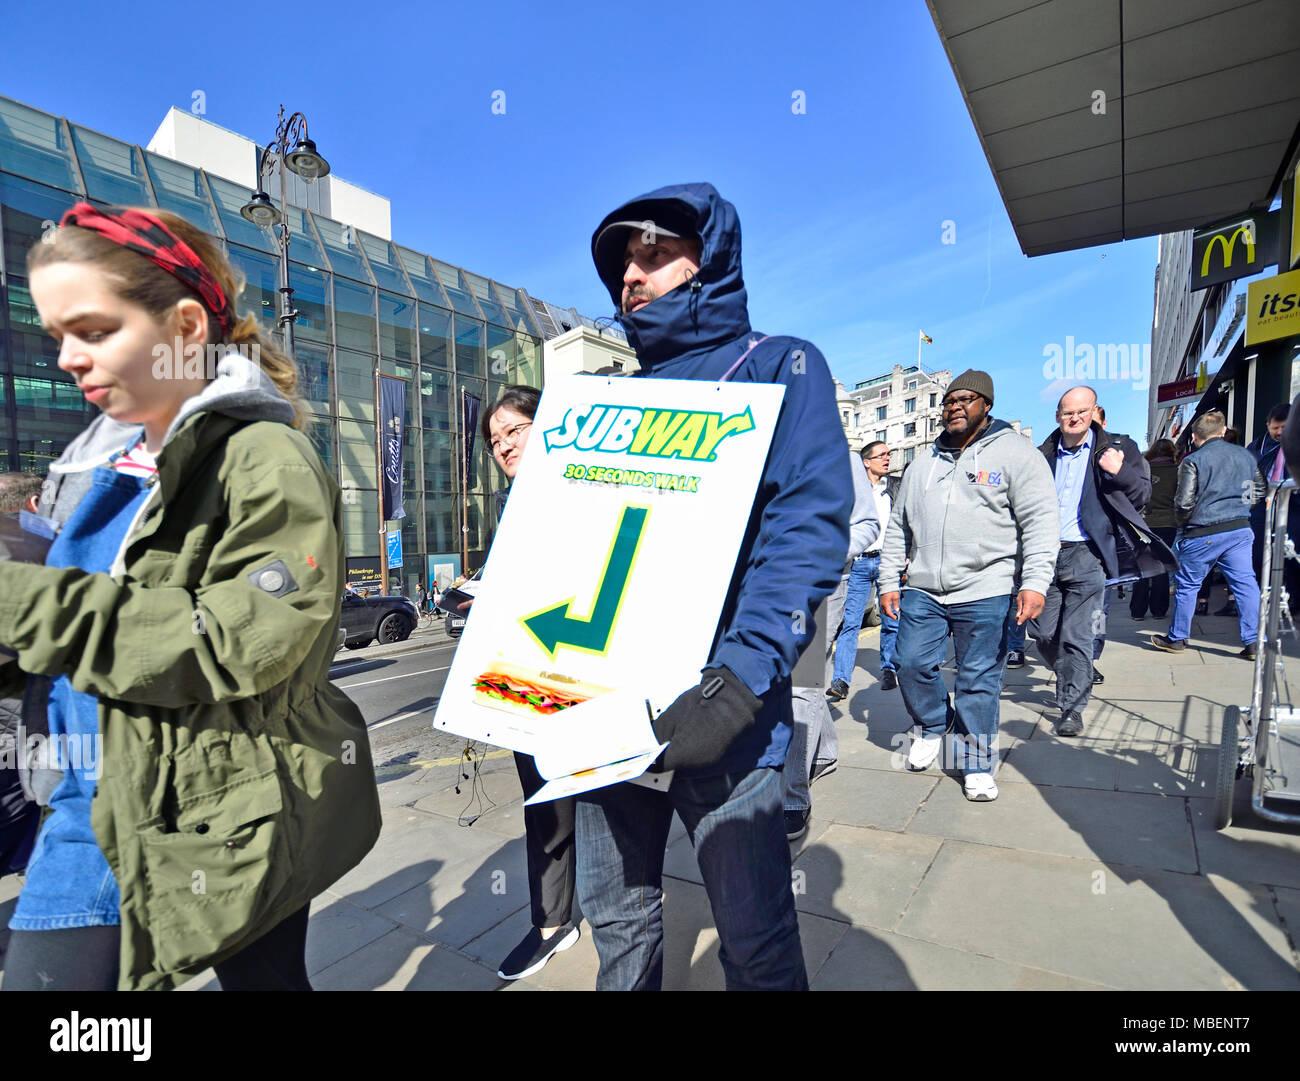 London, England, UK. Man ijn Oxford Street holding advertising for Subway sandwich shop - Stock Image